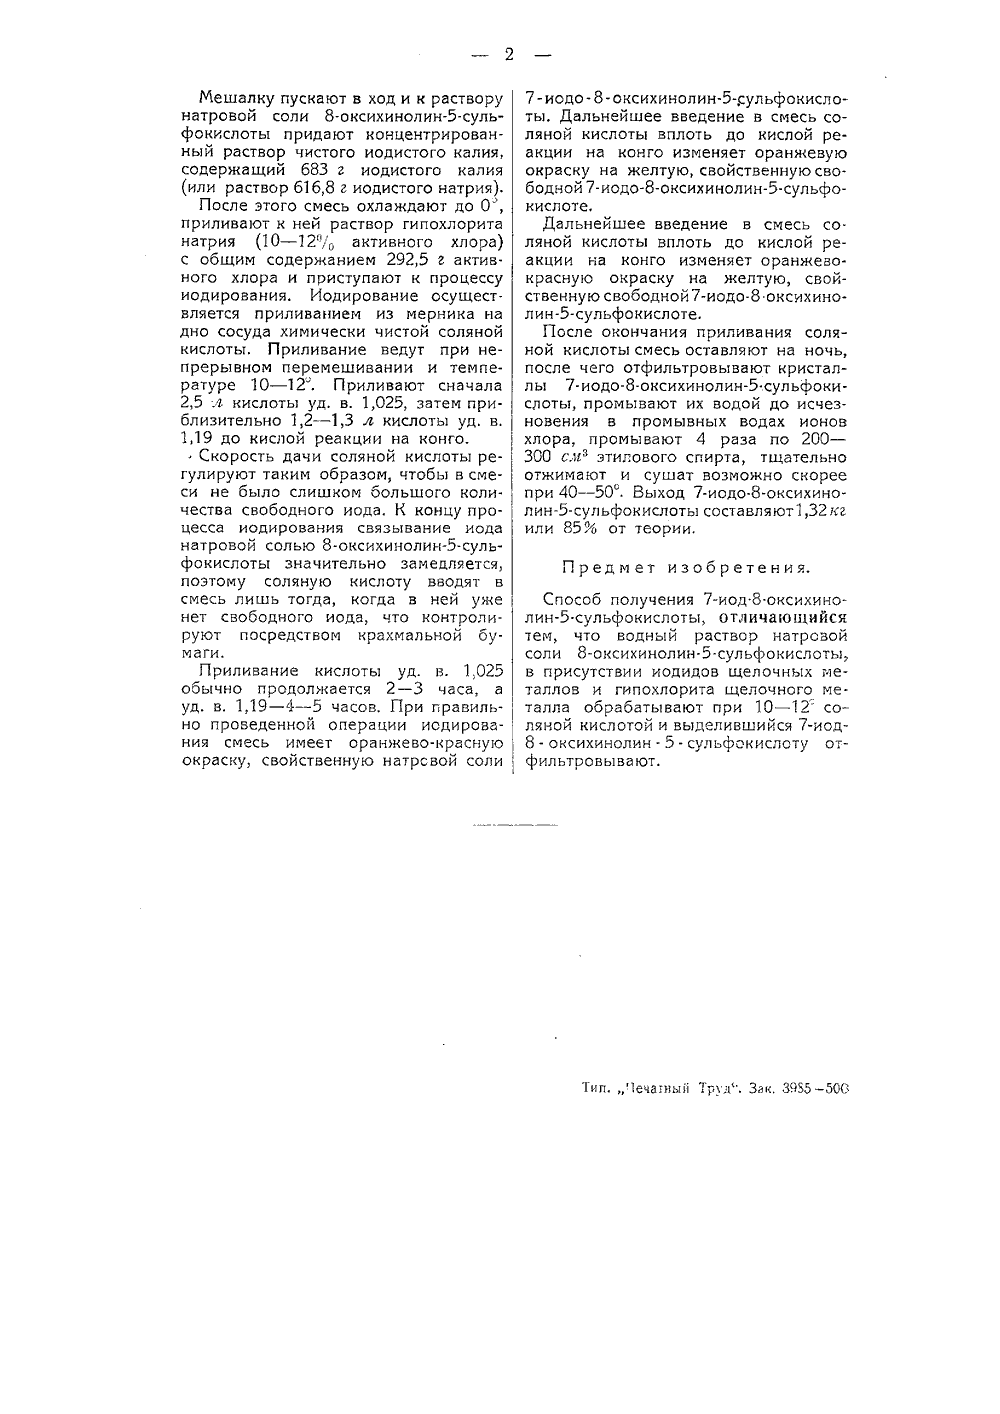 Калия гидроксихинолин